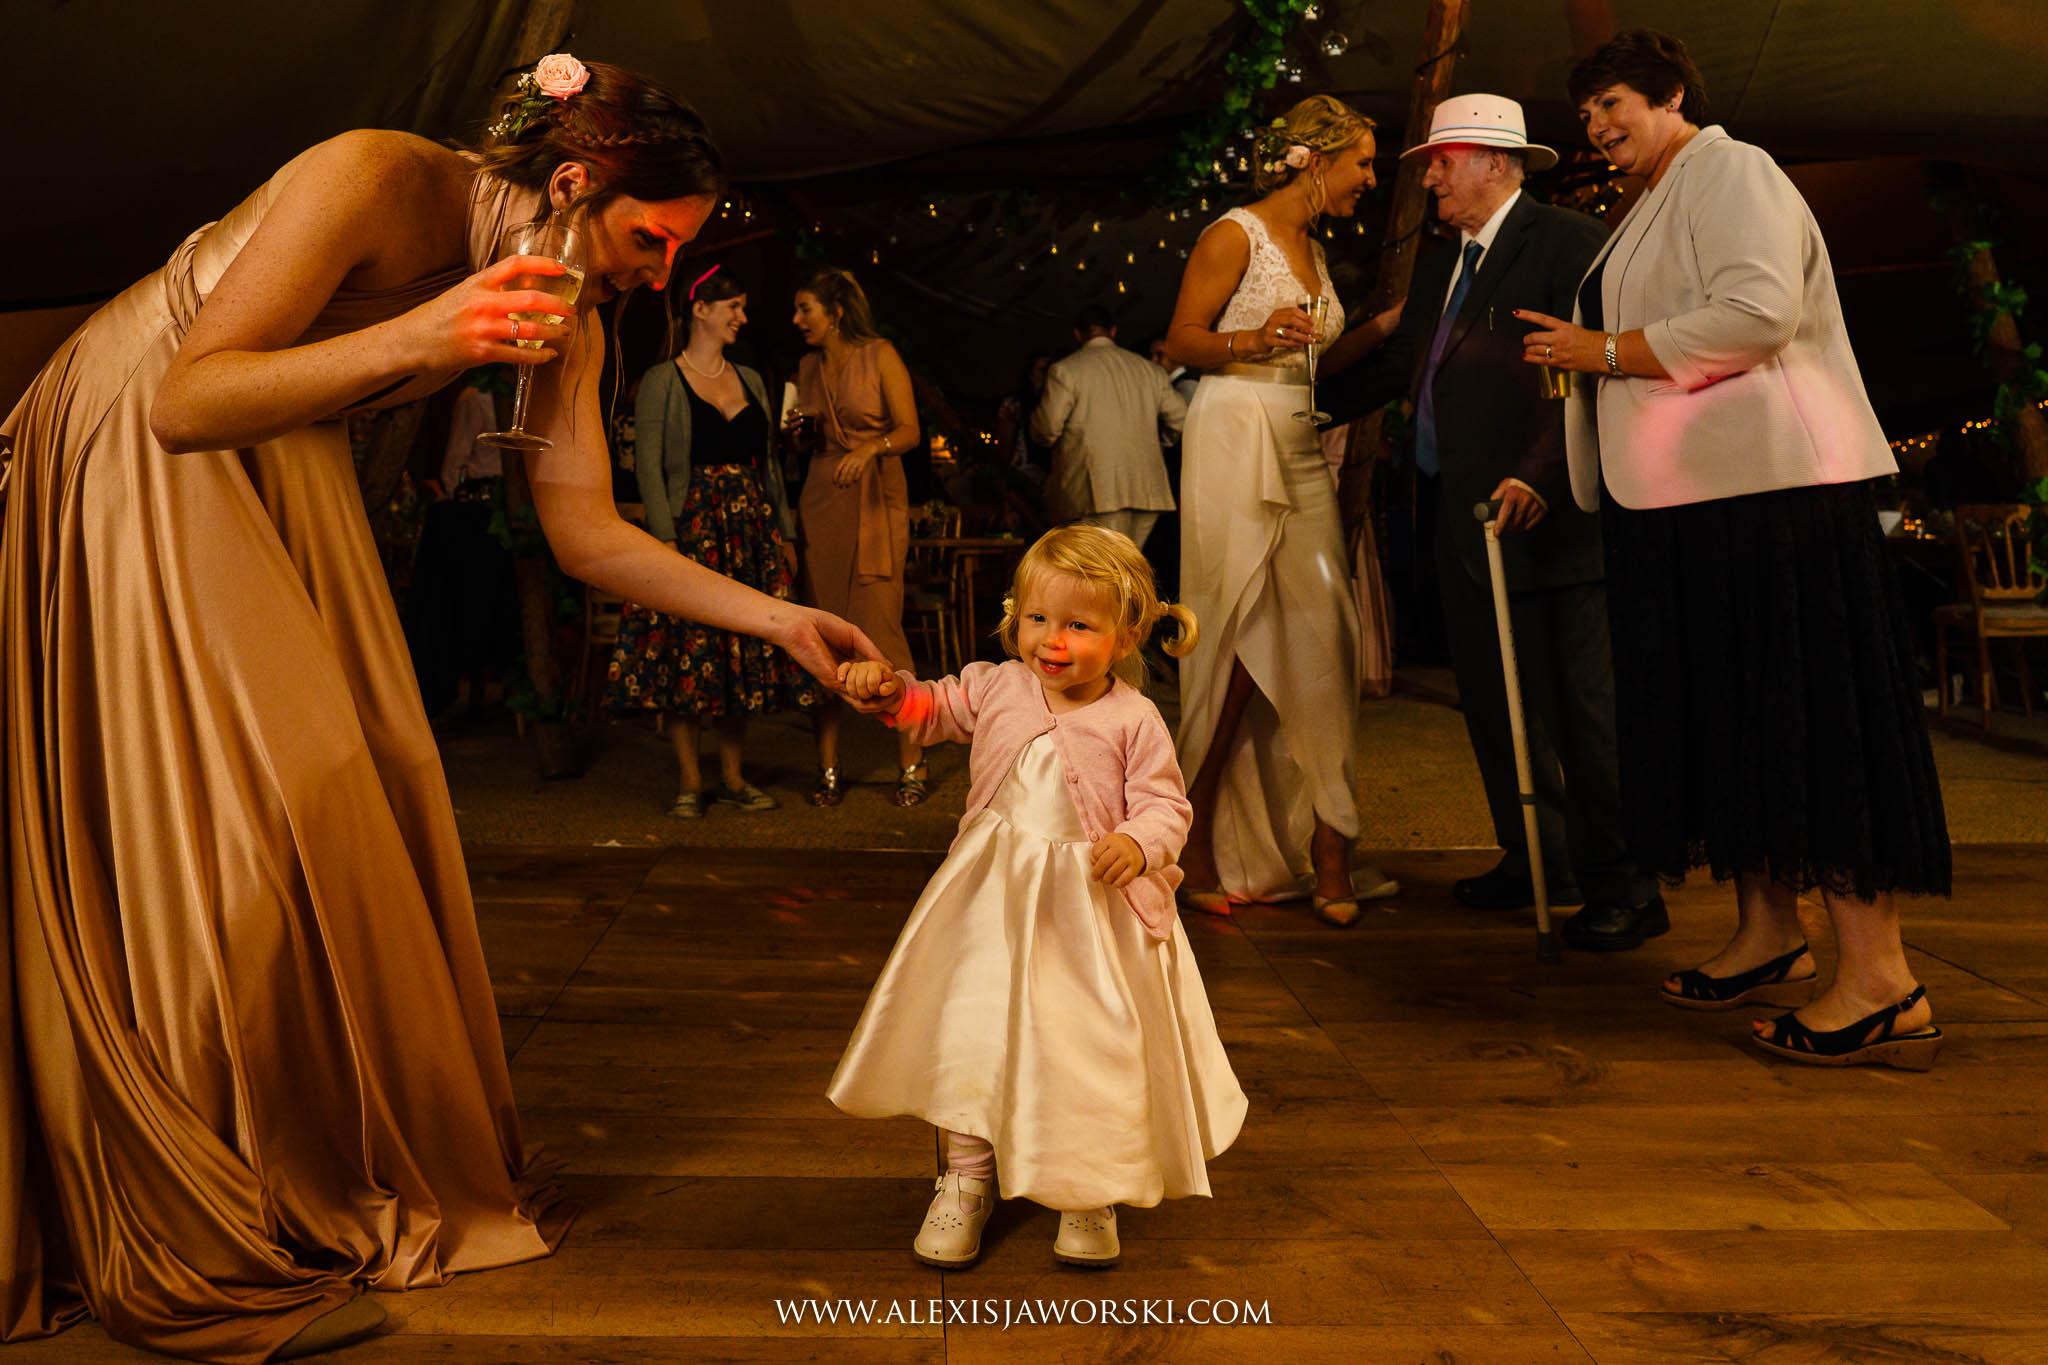 gathering onto the dance floor